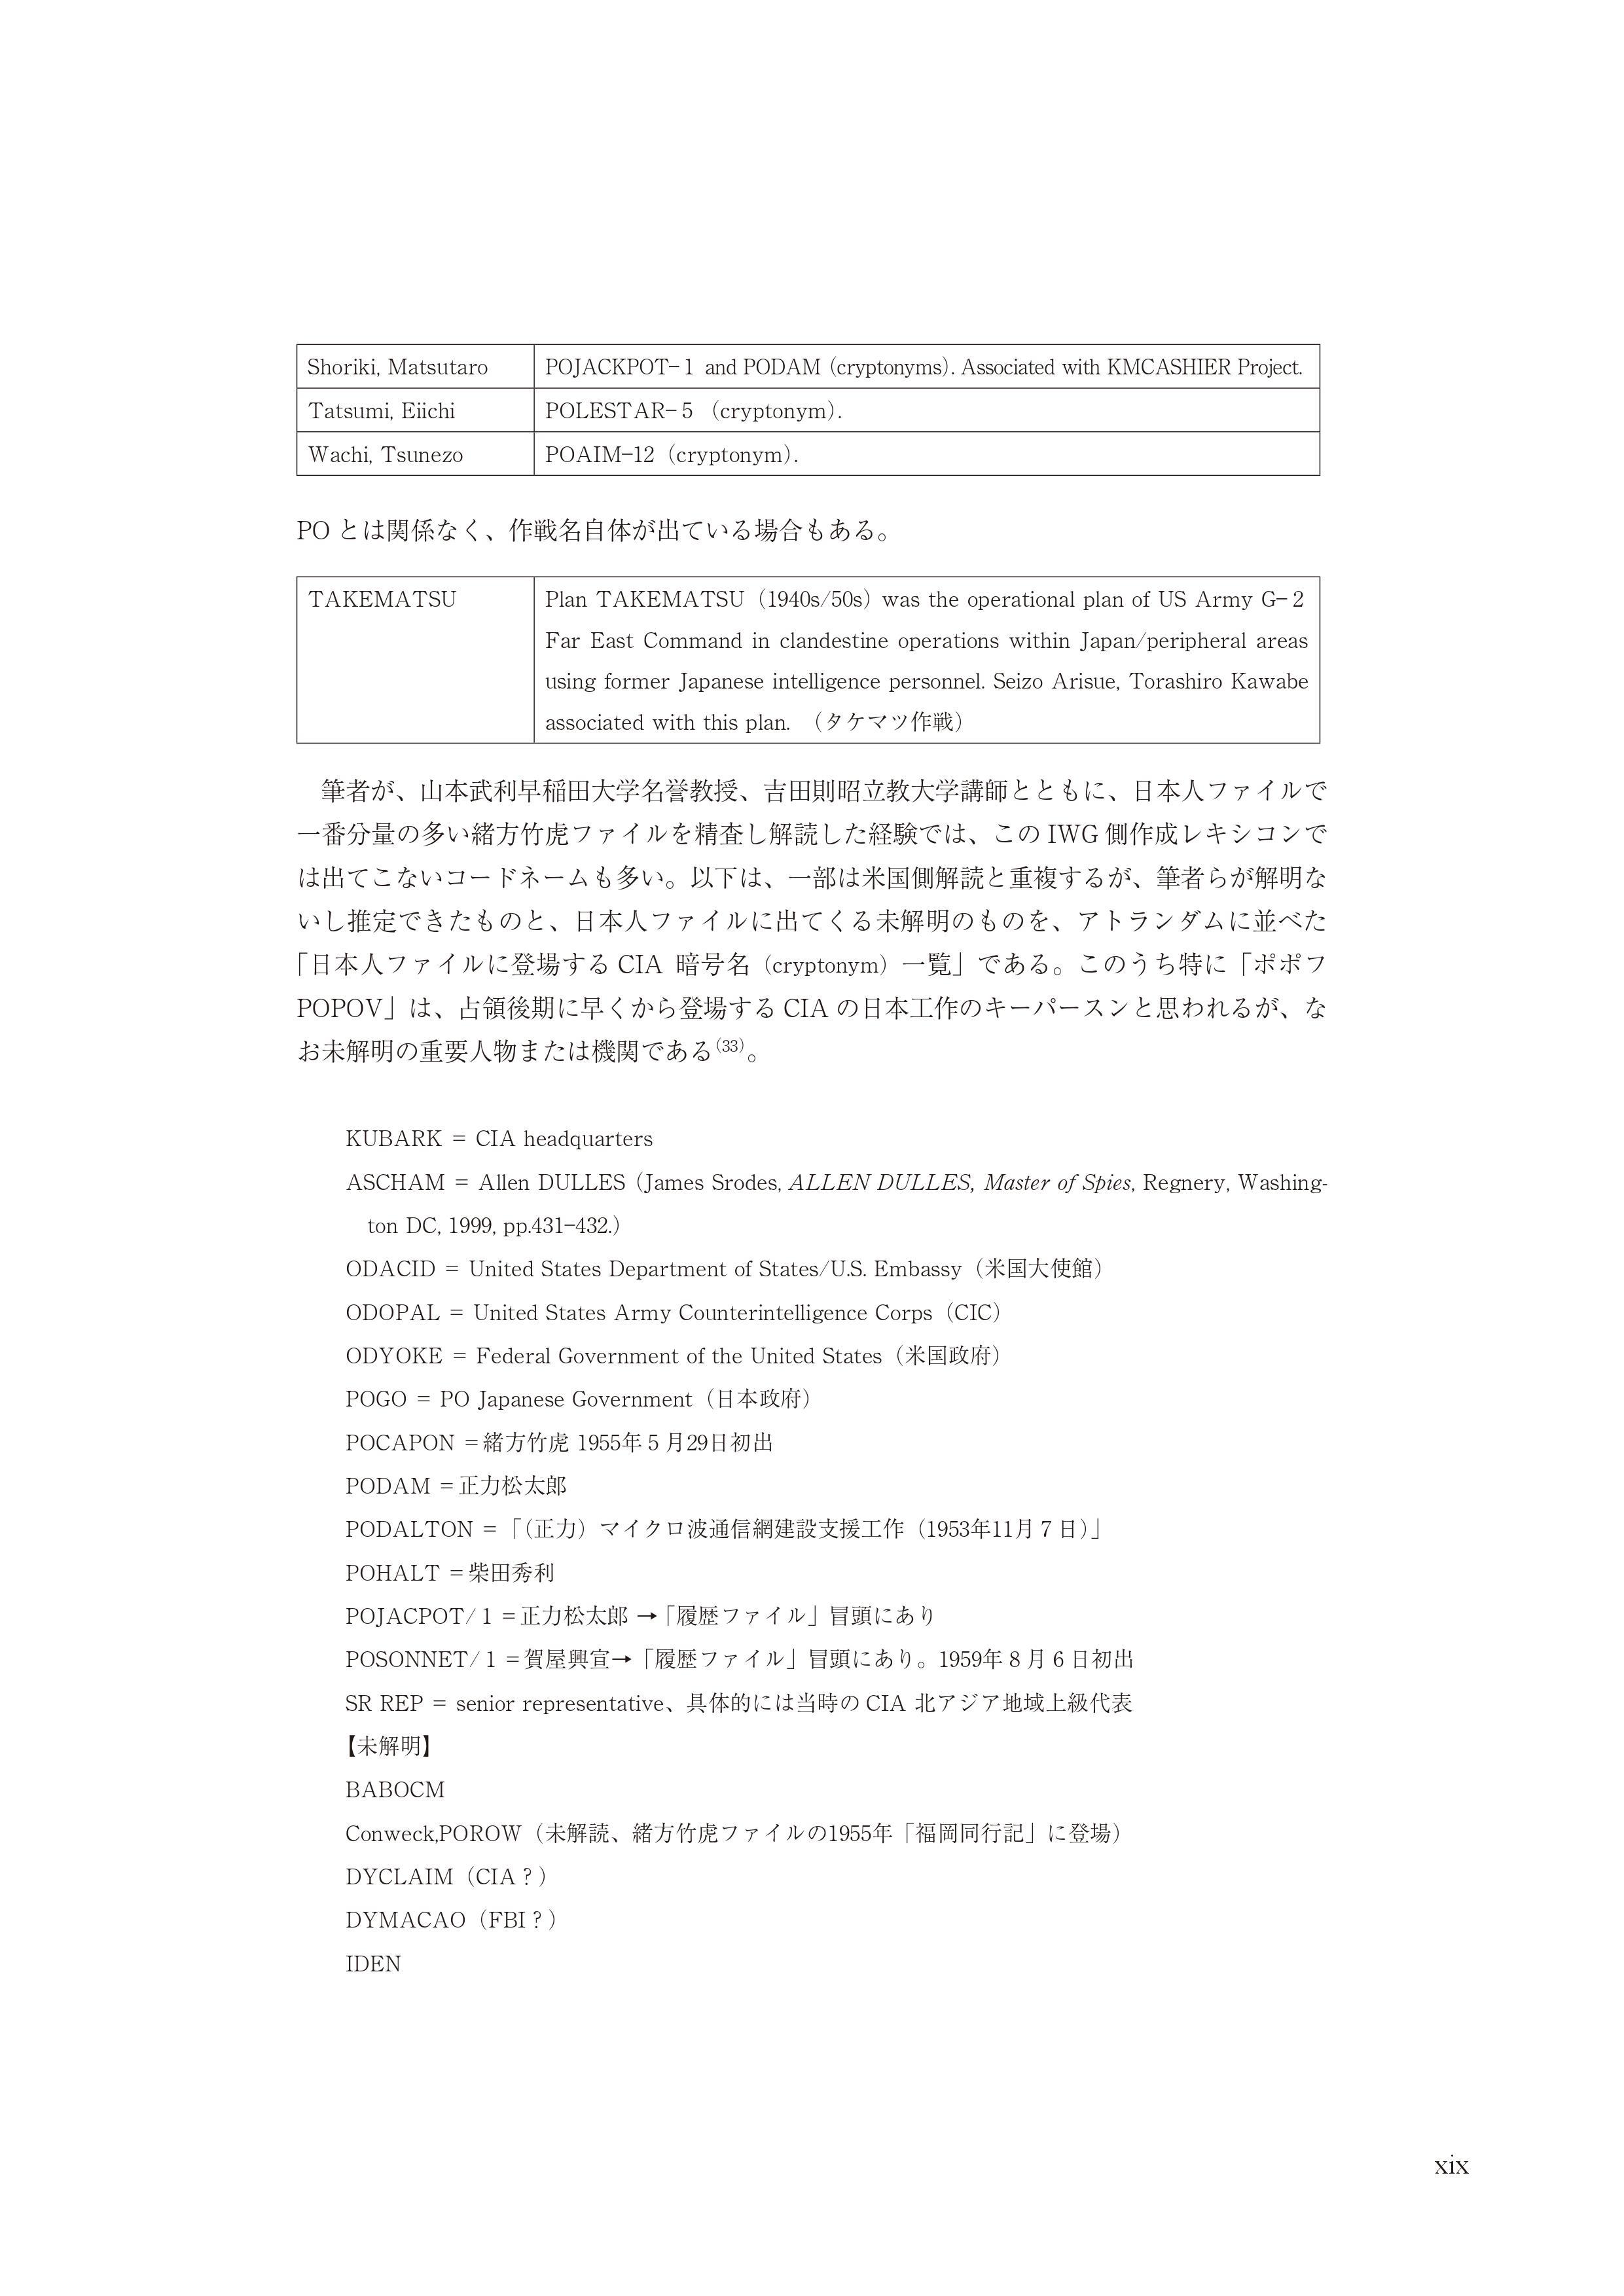 CIA日本人ファイル0001 (19)